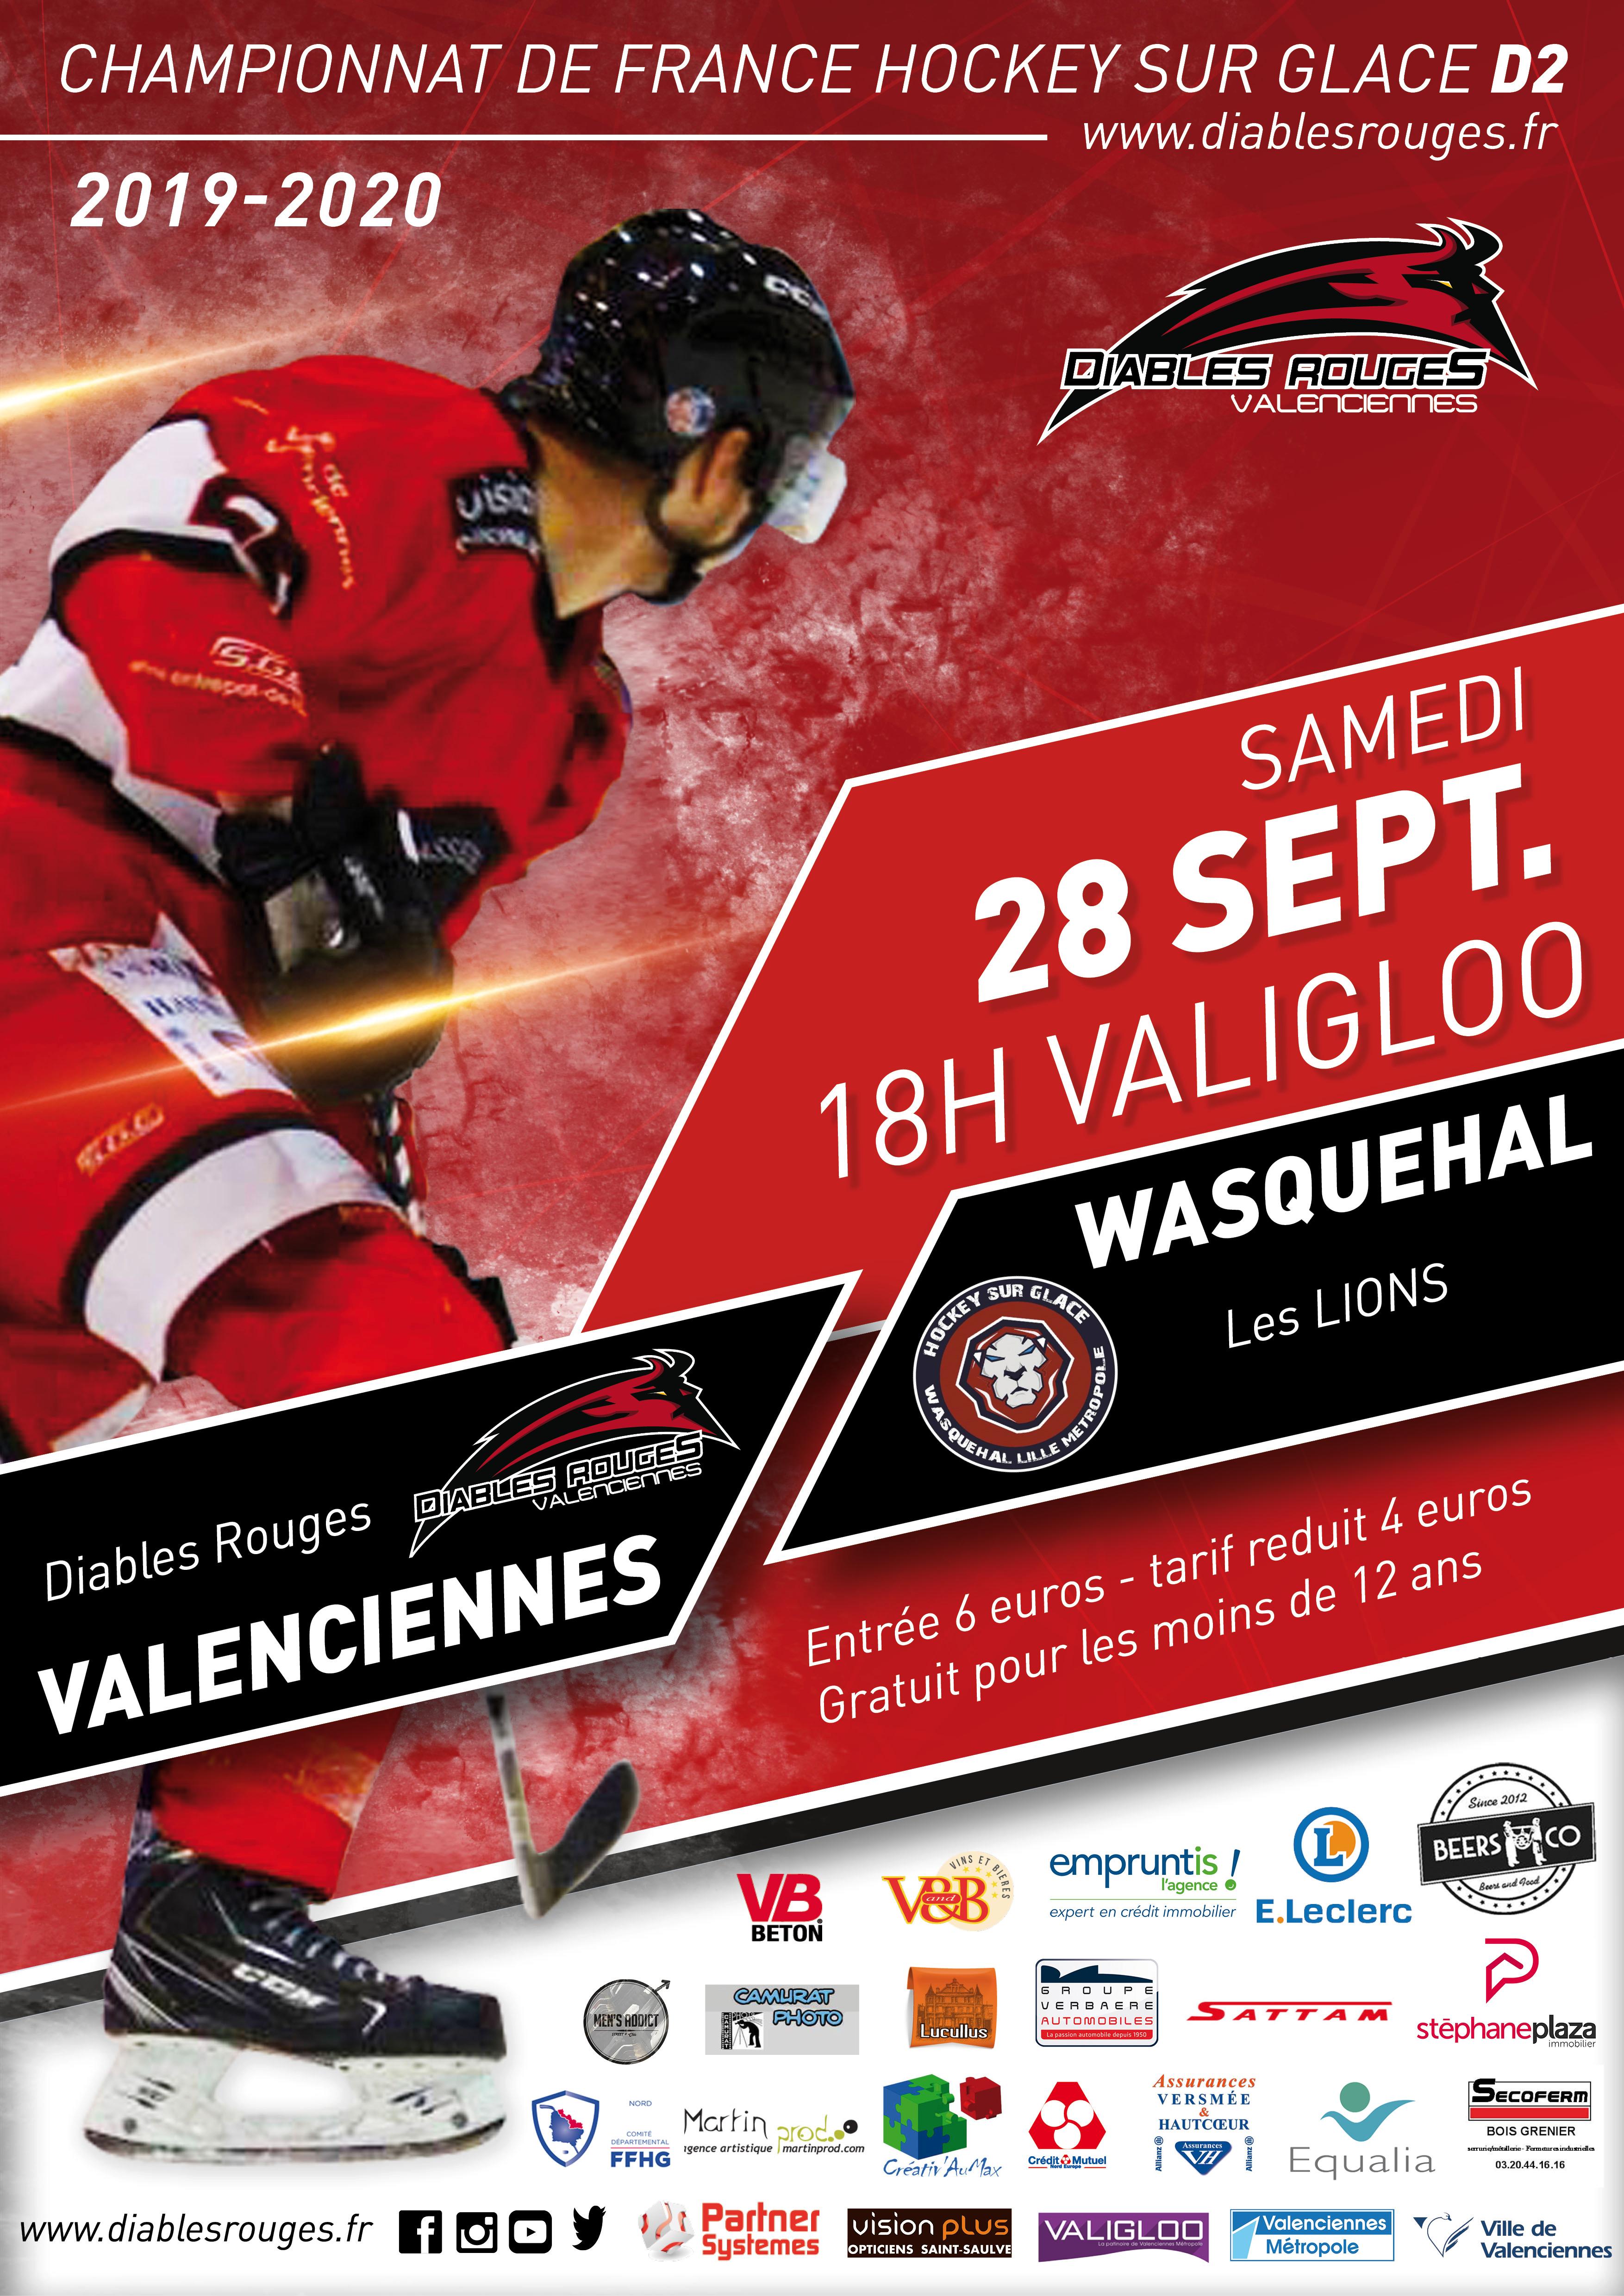 Valenciennes reçoit Wasquehal ce samedi 28 septembre 2019 – DERBY